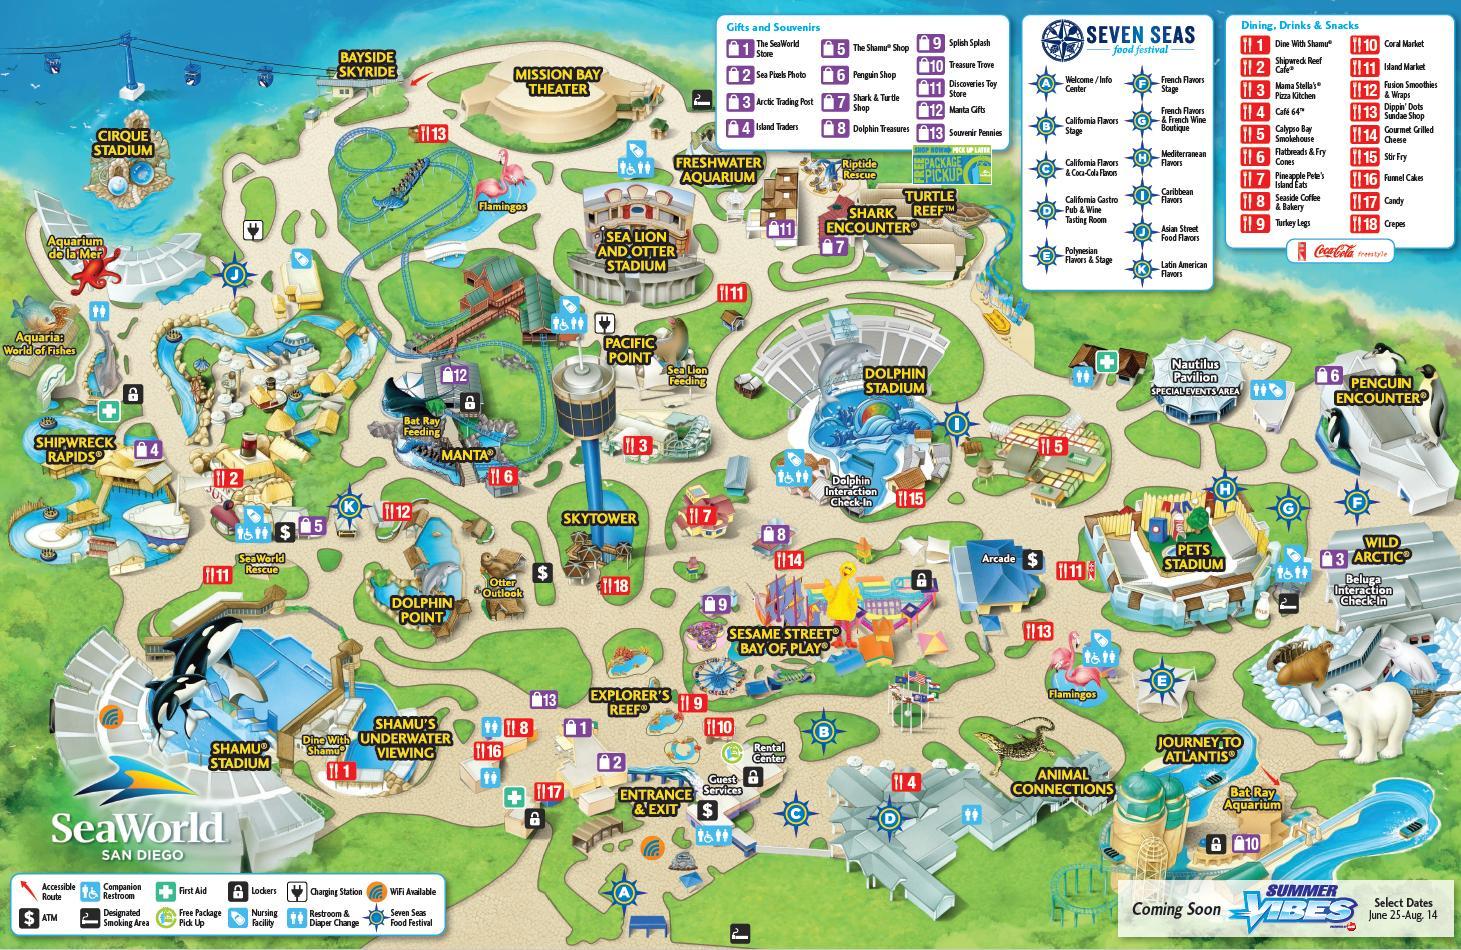 Seaworld San Diego Park Map Worlds Maps Archives New Seaworld - Printable Map Of Sea World Orlando